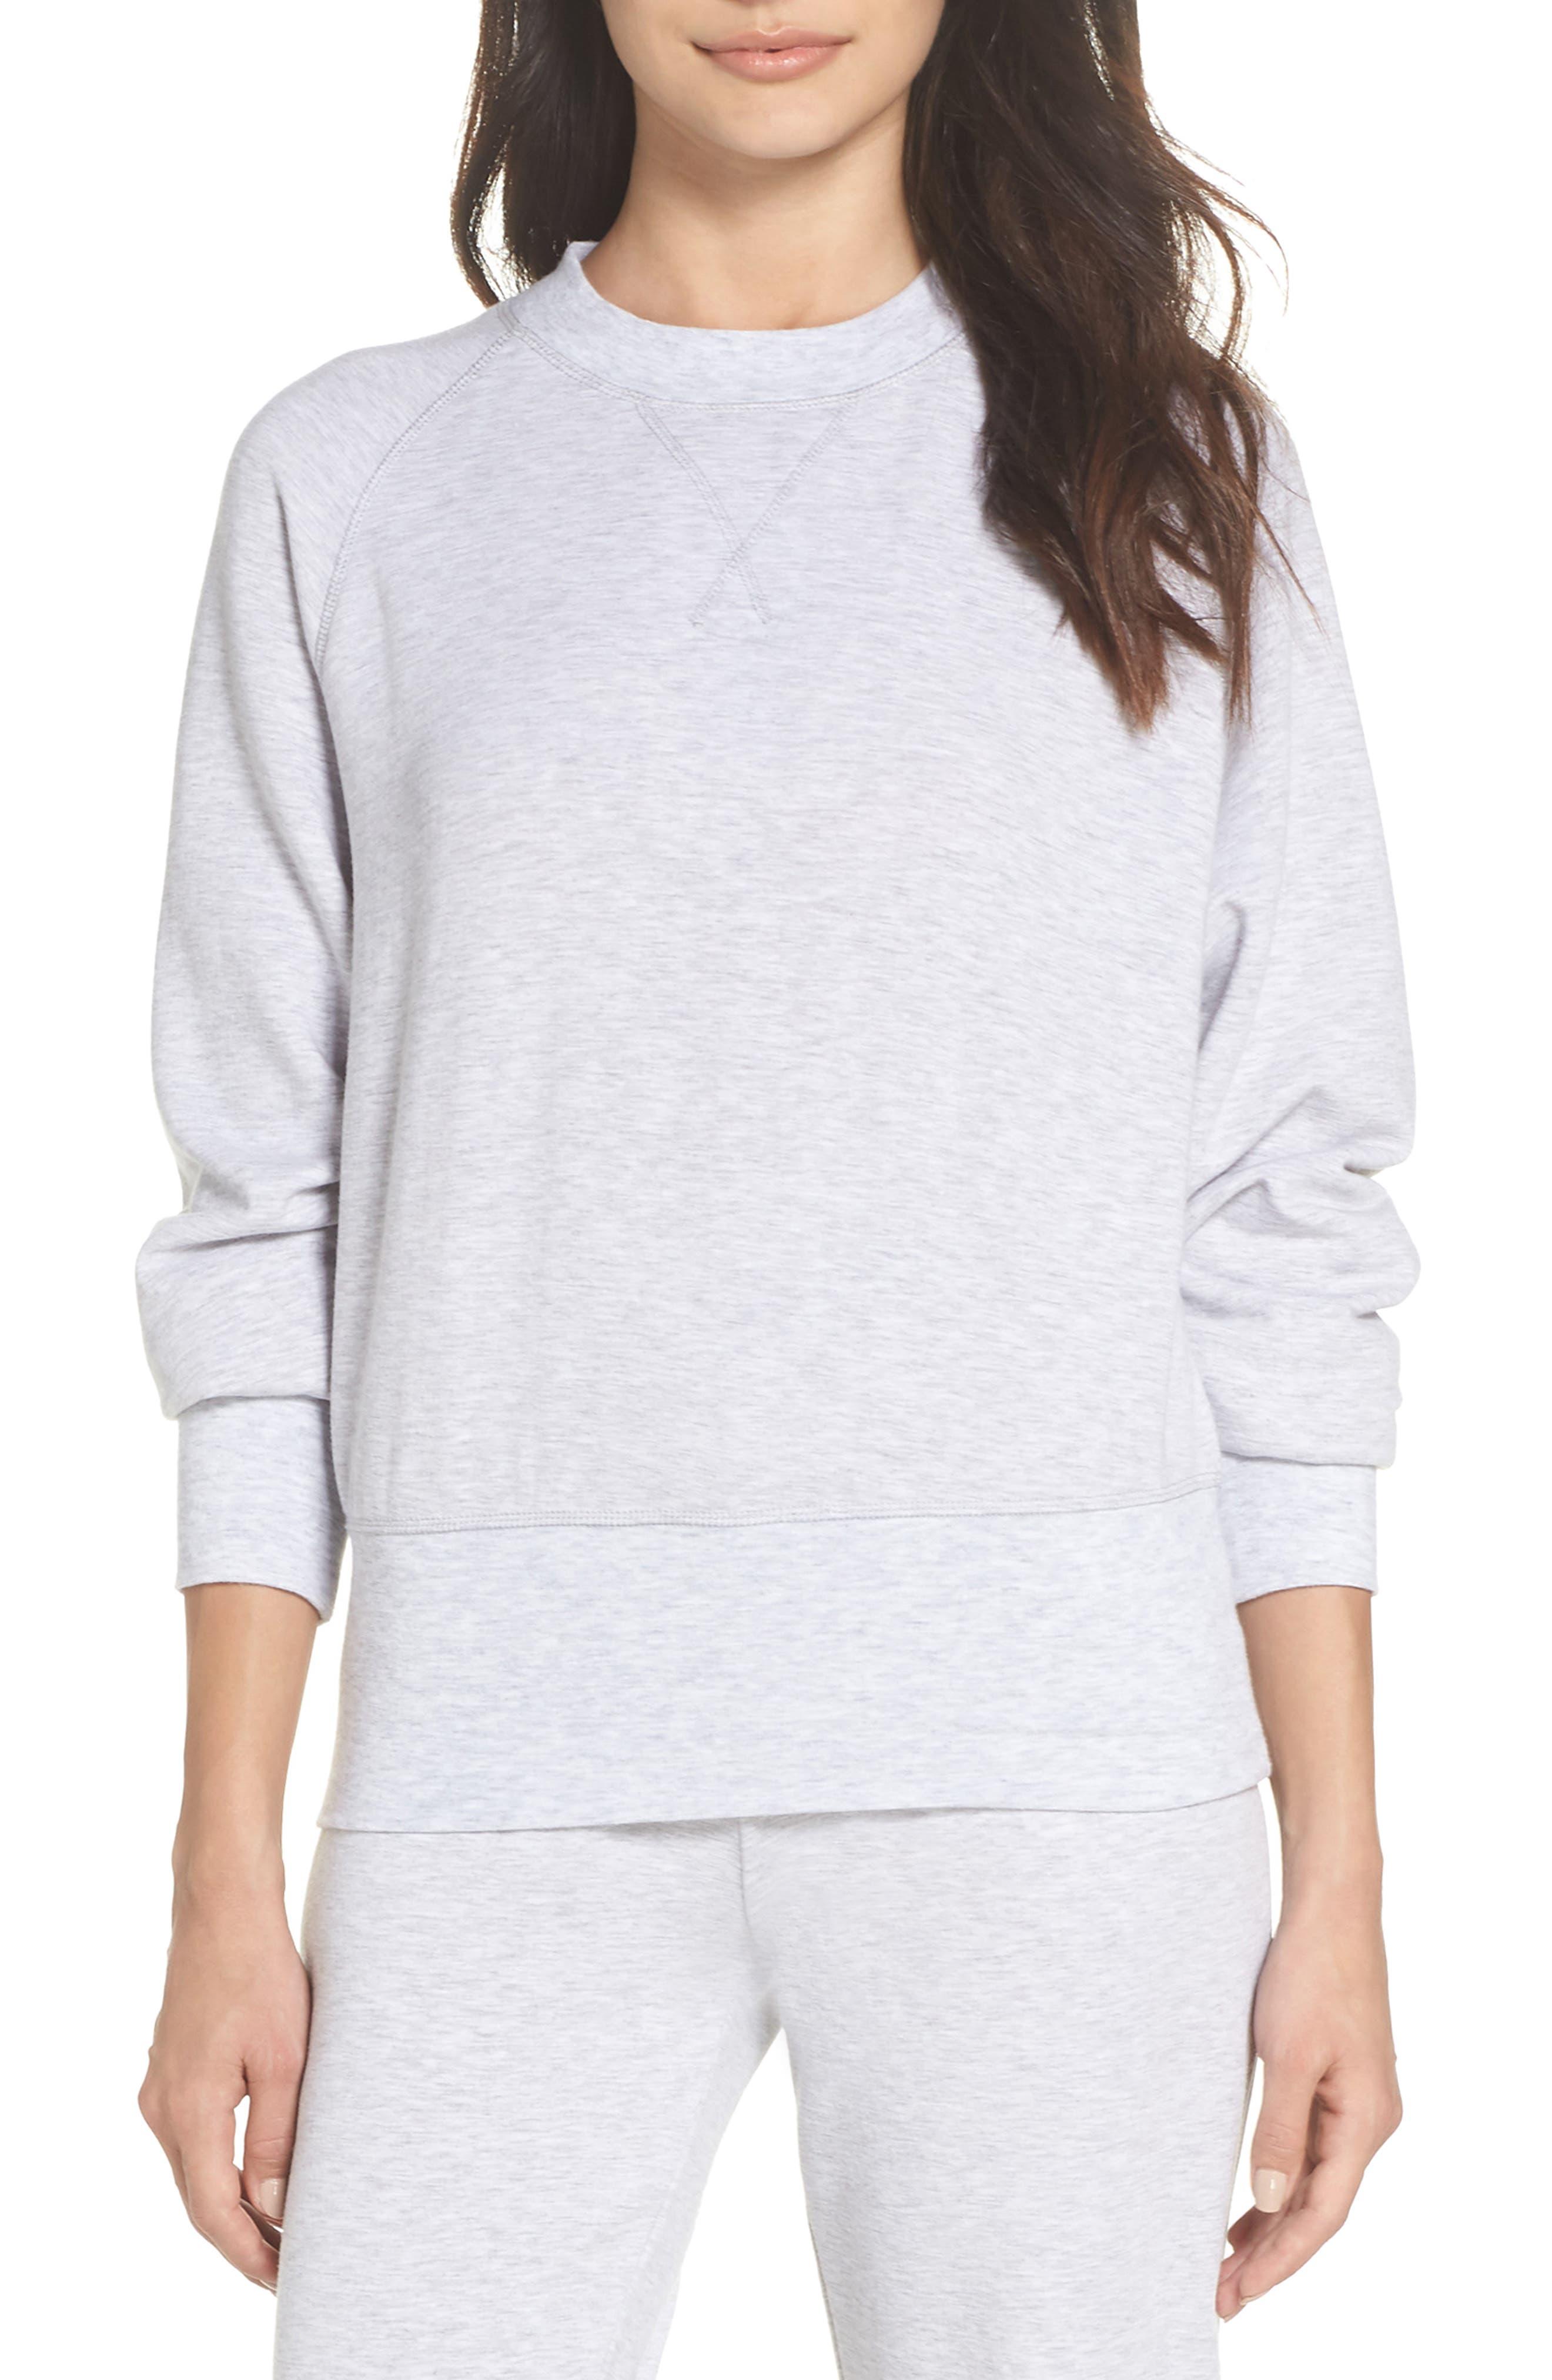 Cool Touch Sweatshirt,                             Main thumbnail 1, color,                             GREY